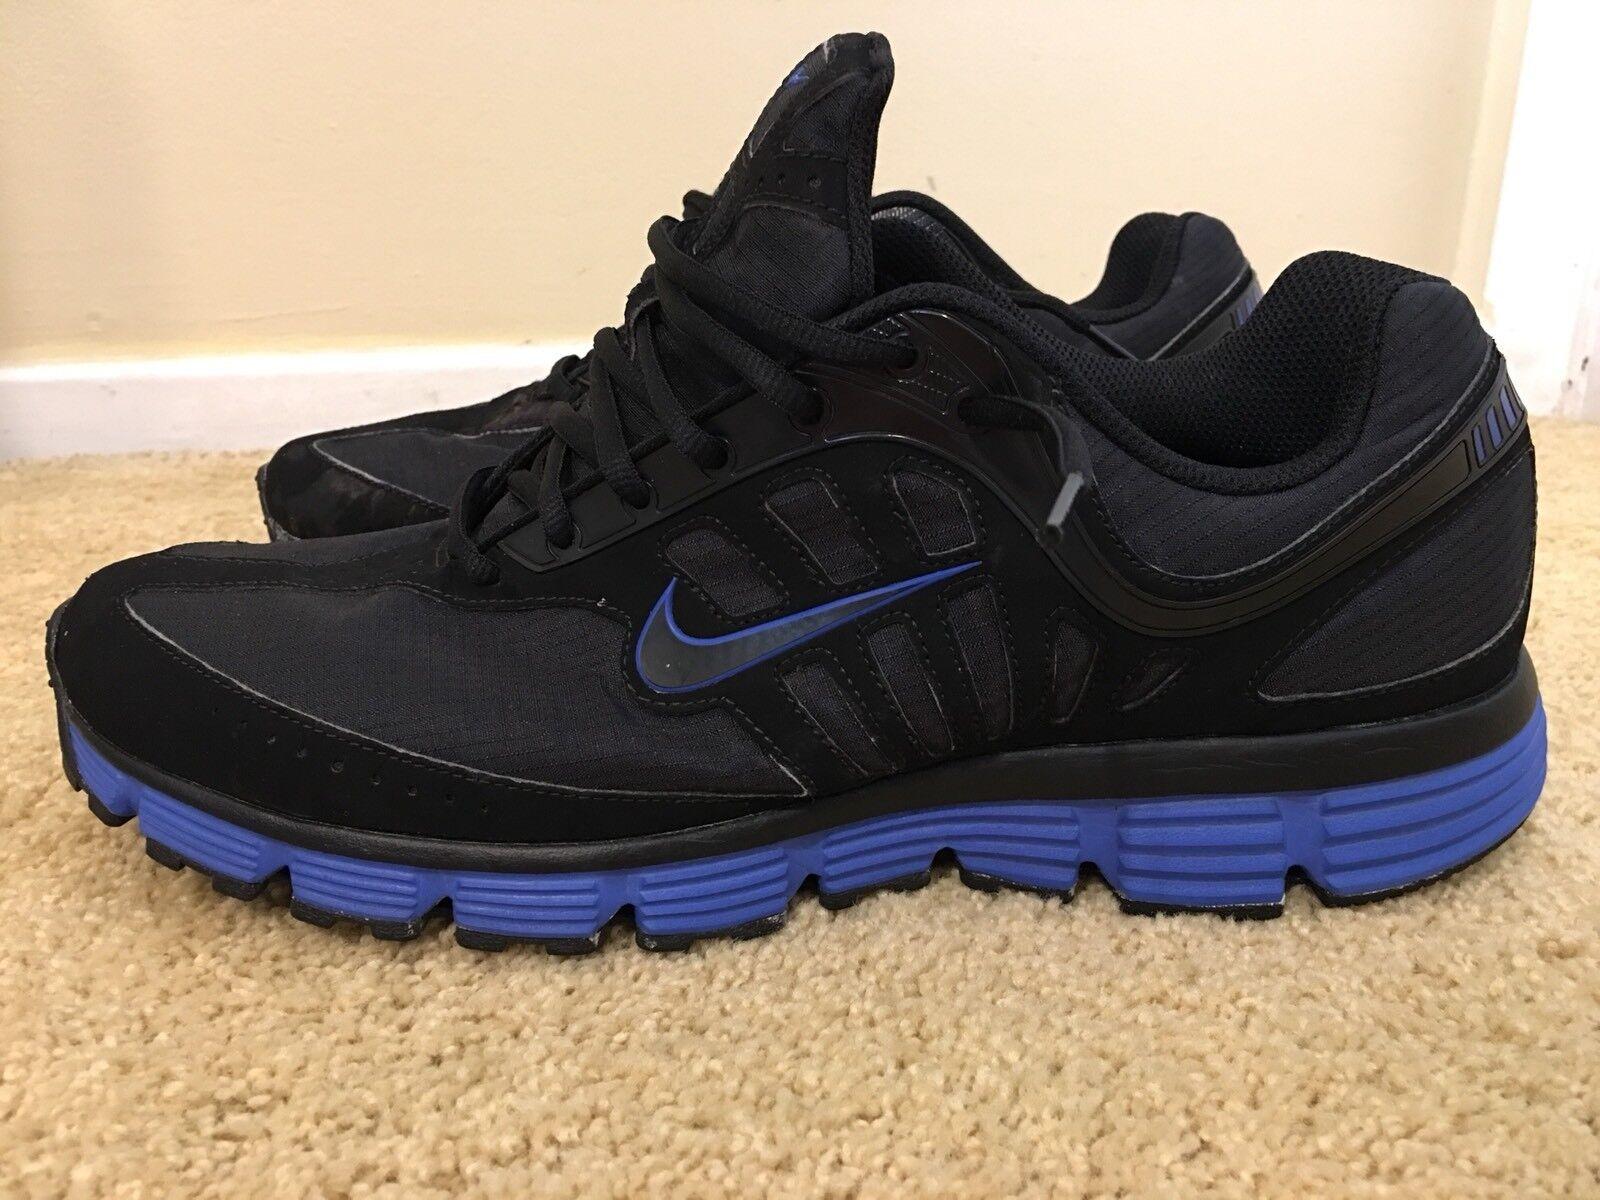 Nike Inspire Dual Fusion, 431997-004, Noir/Bleu, Homme Running Chaussures,